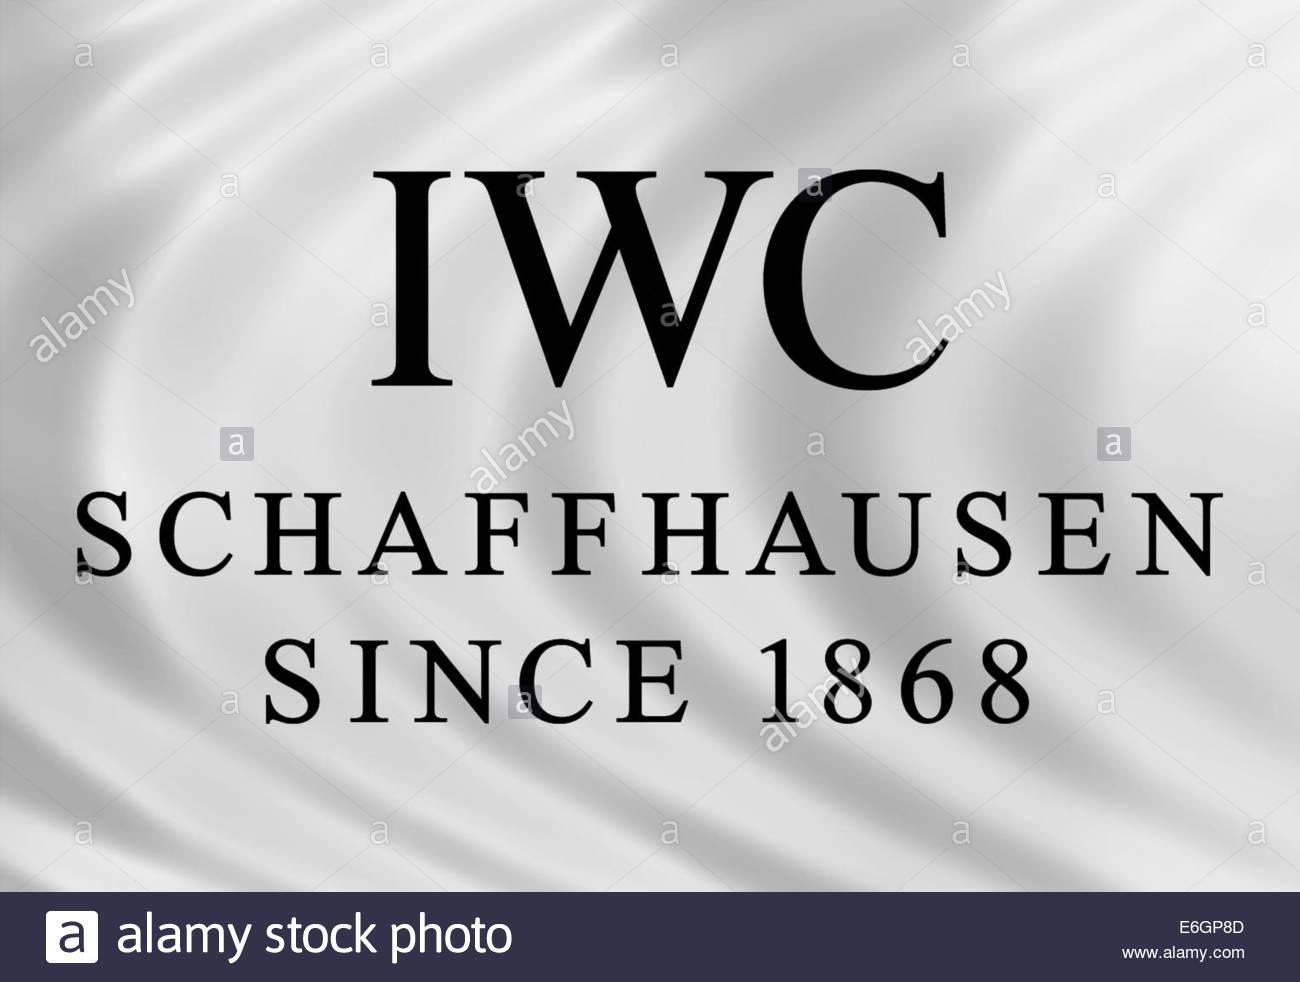 International Watch Company logo IWC icona bandiera isolato Immagini Stock